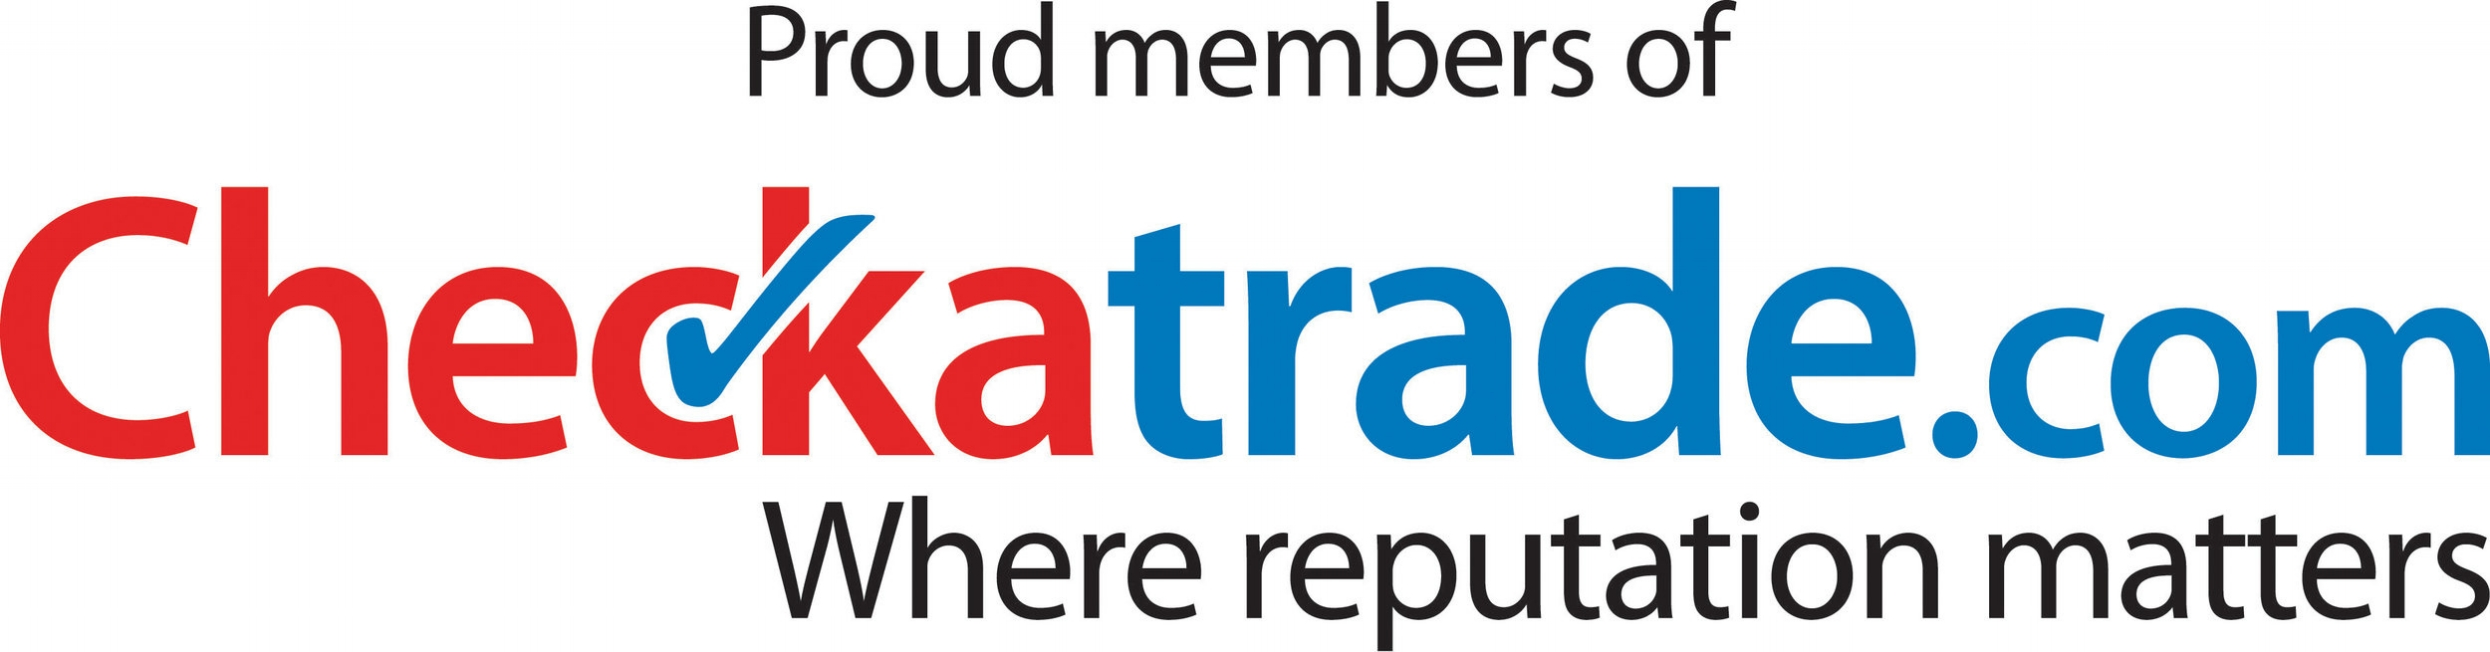 checker_trader_logo.jpg